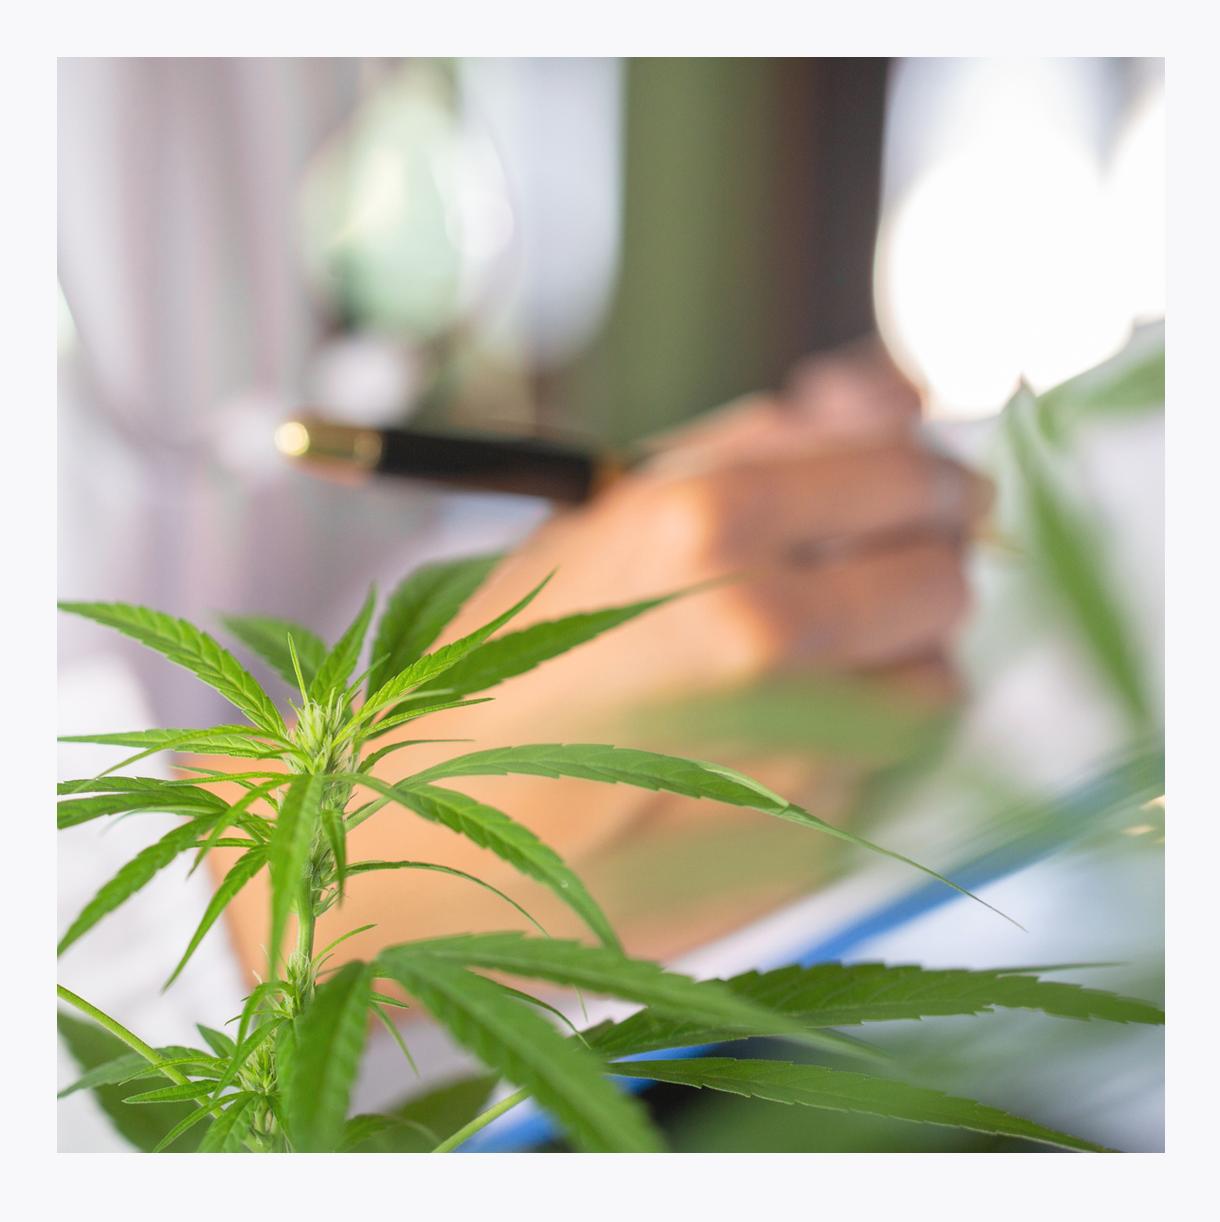 Medical marijuana plant CBD innovative treatment at senior living community